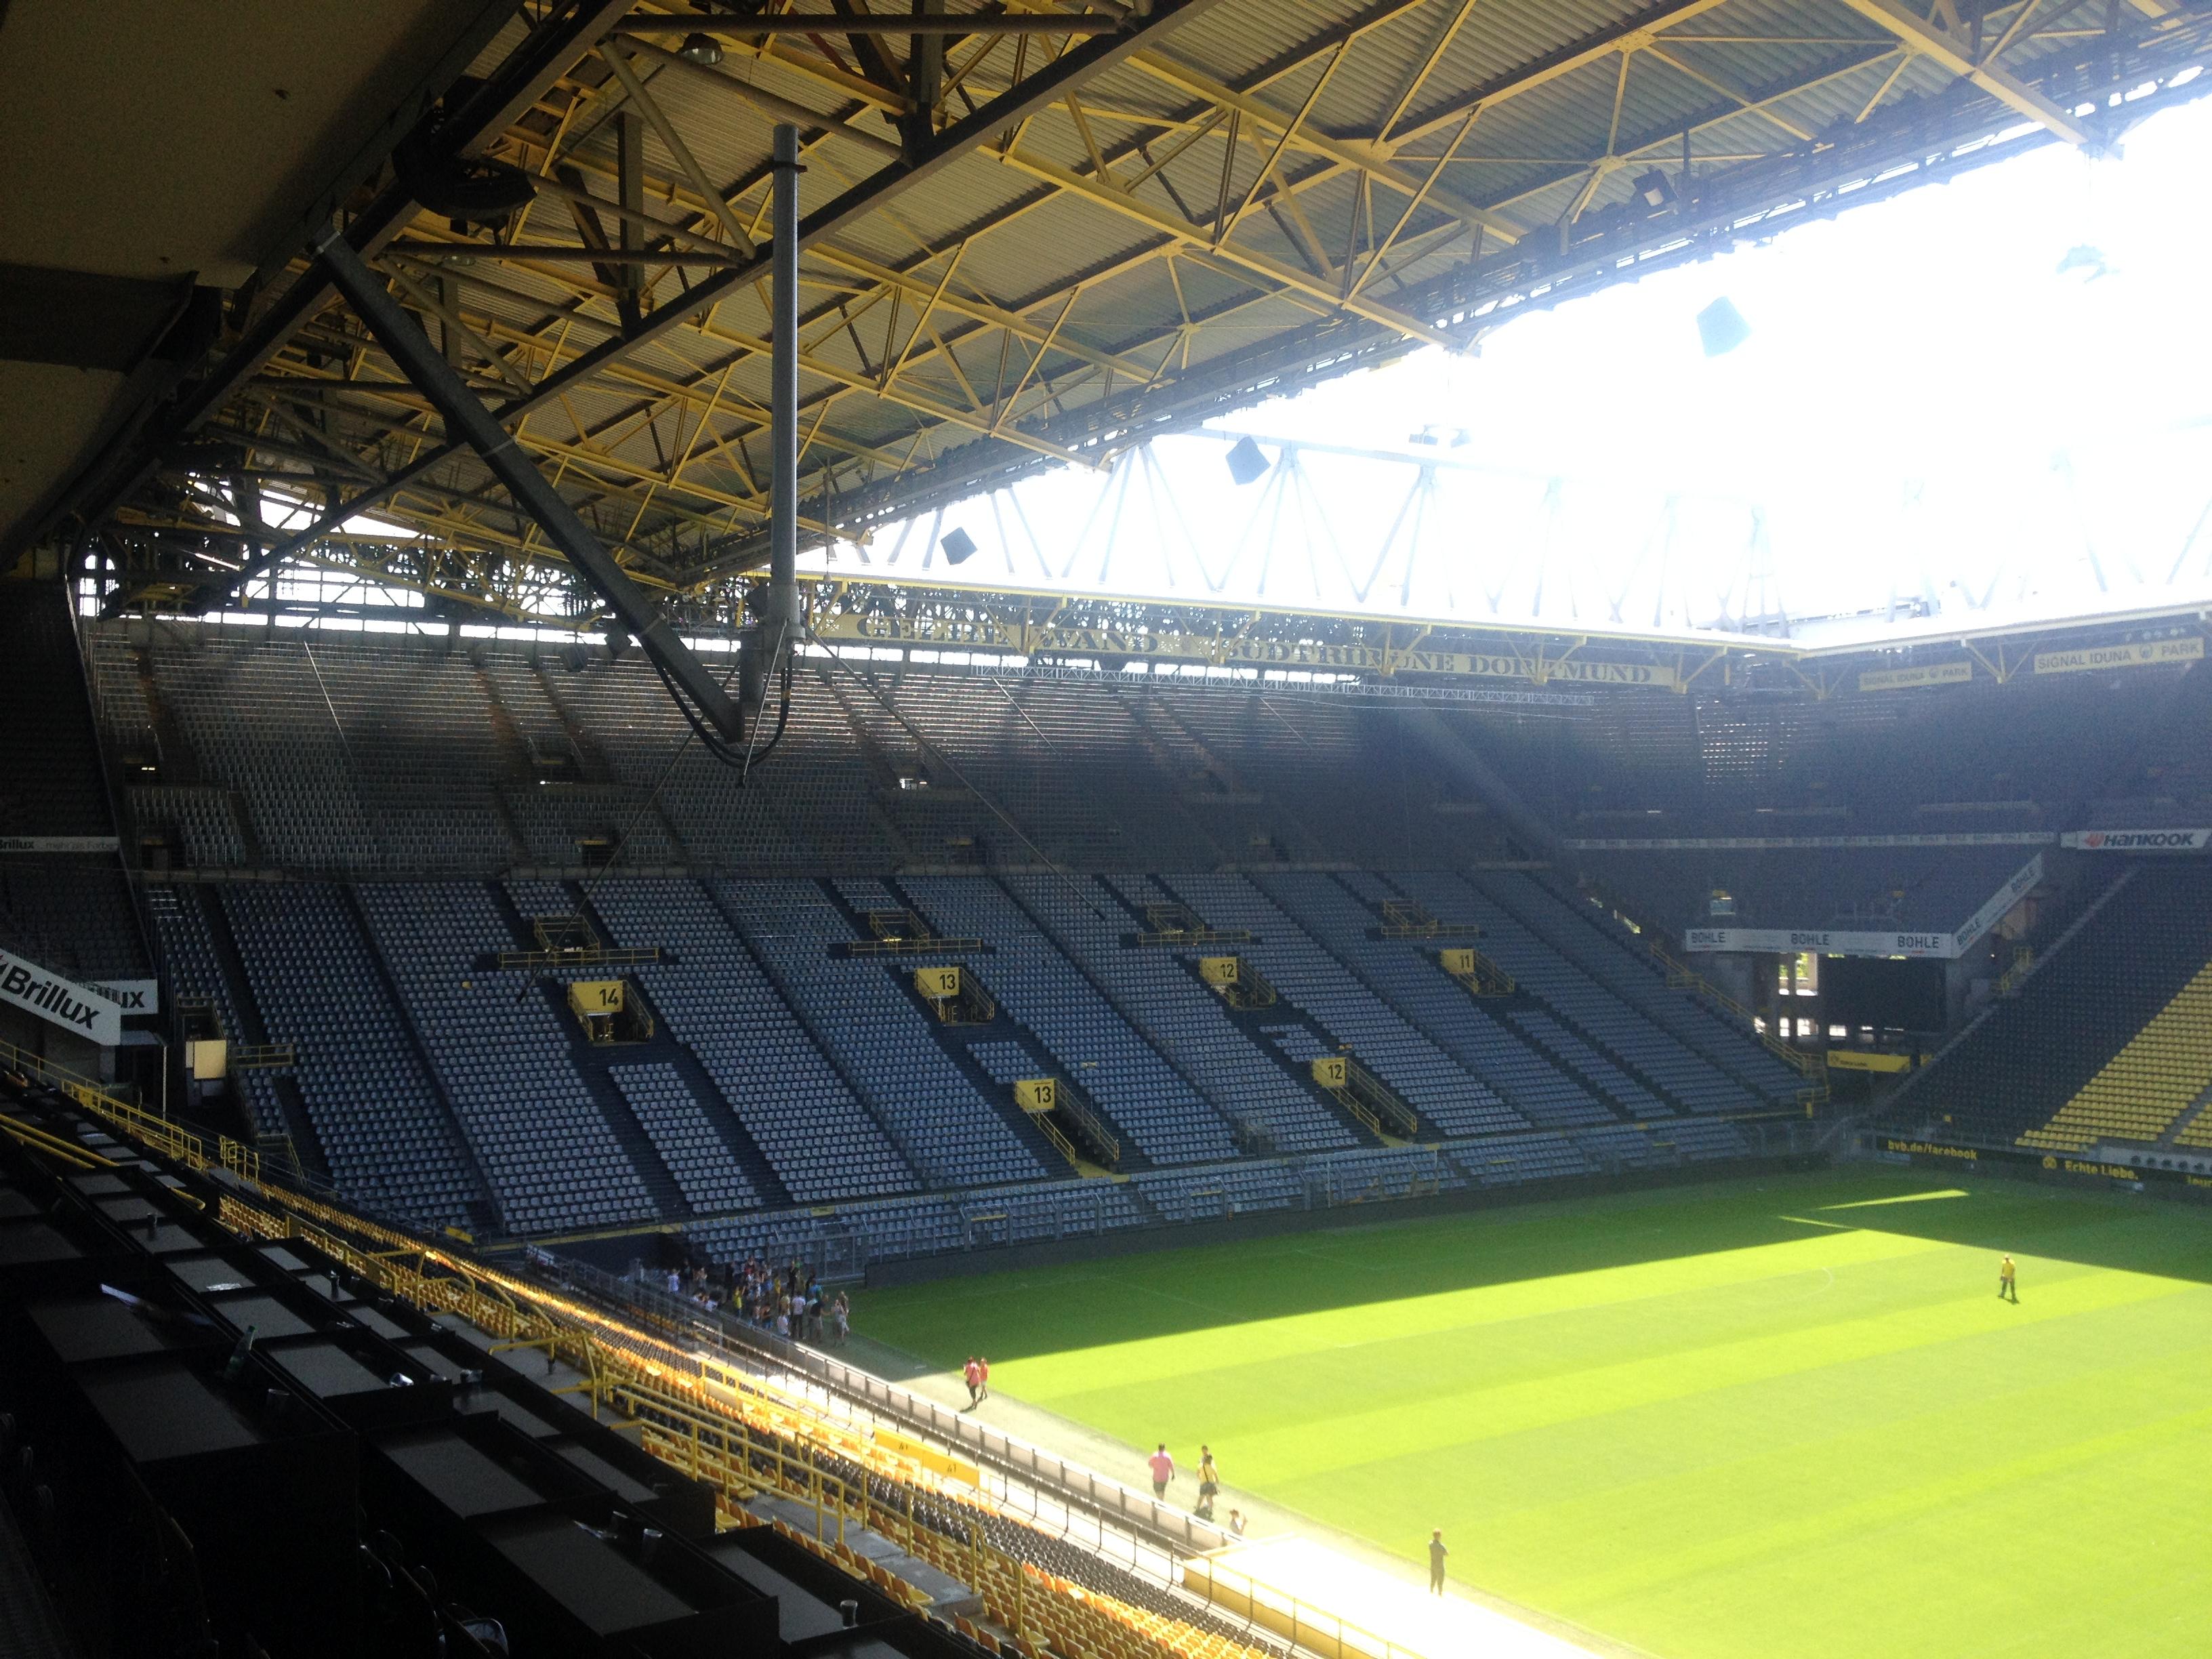 Ruhrgebied 007 - Dortmund